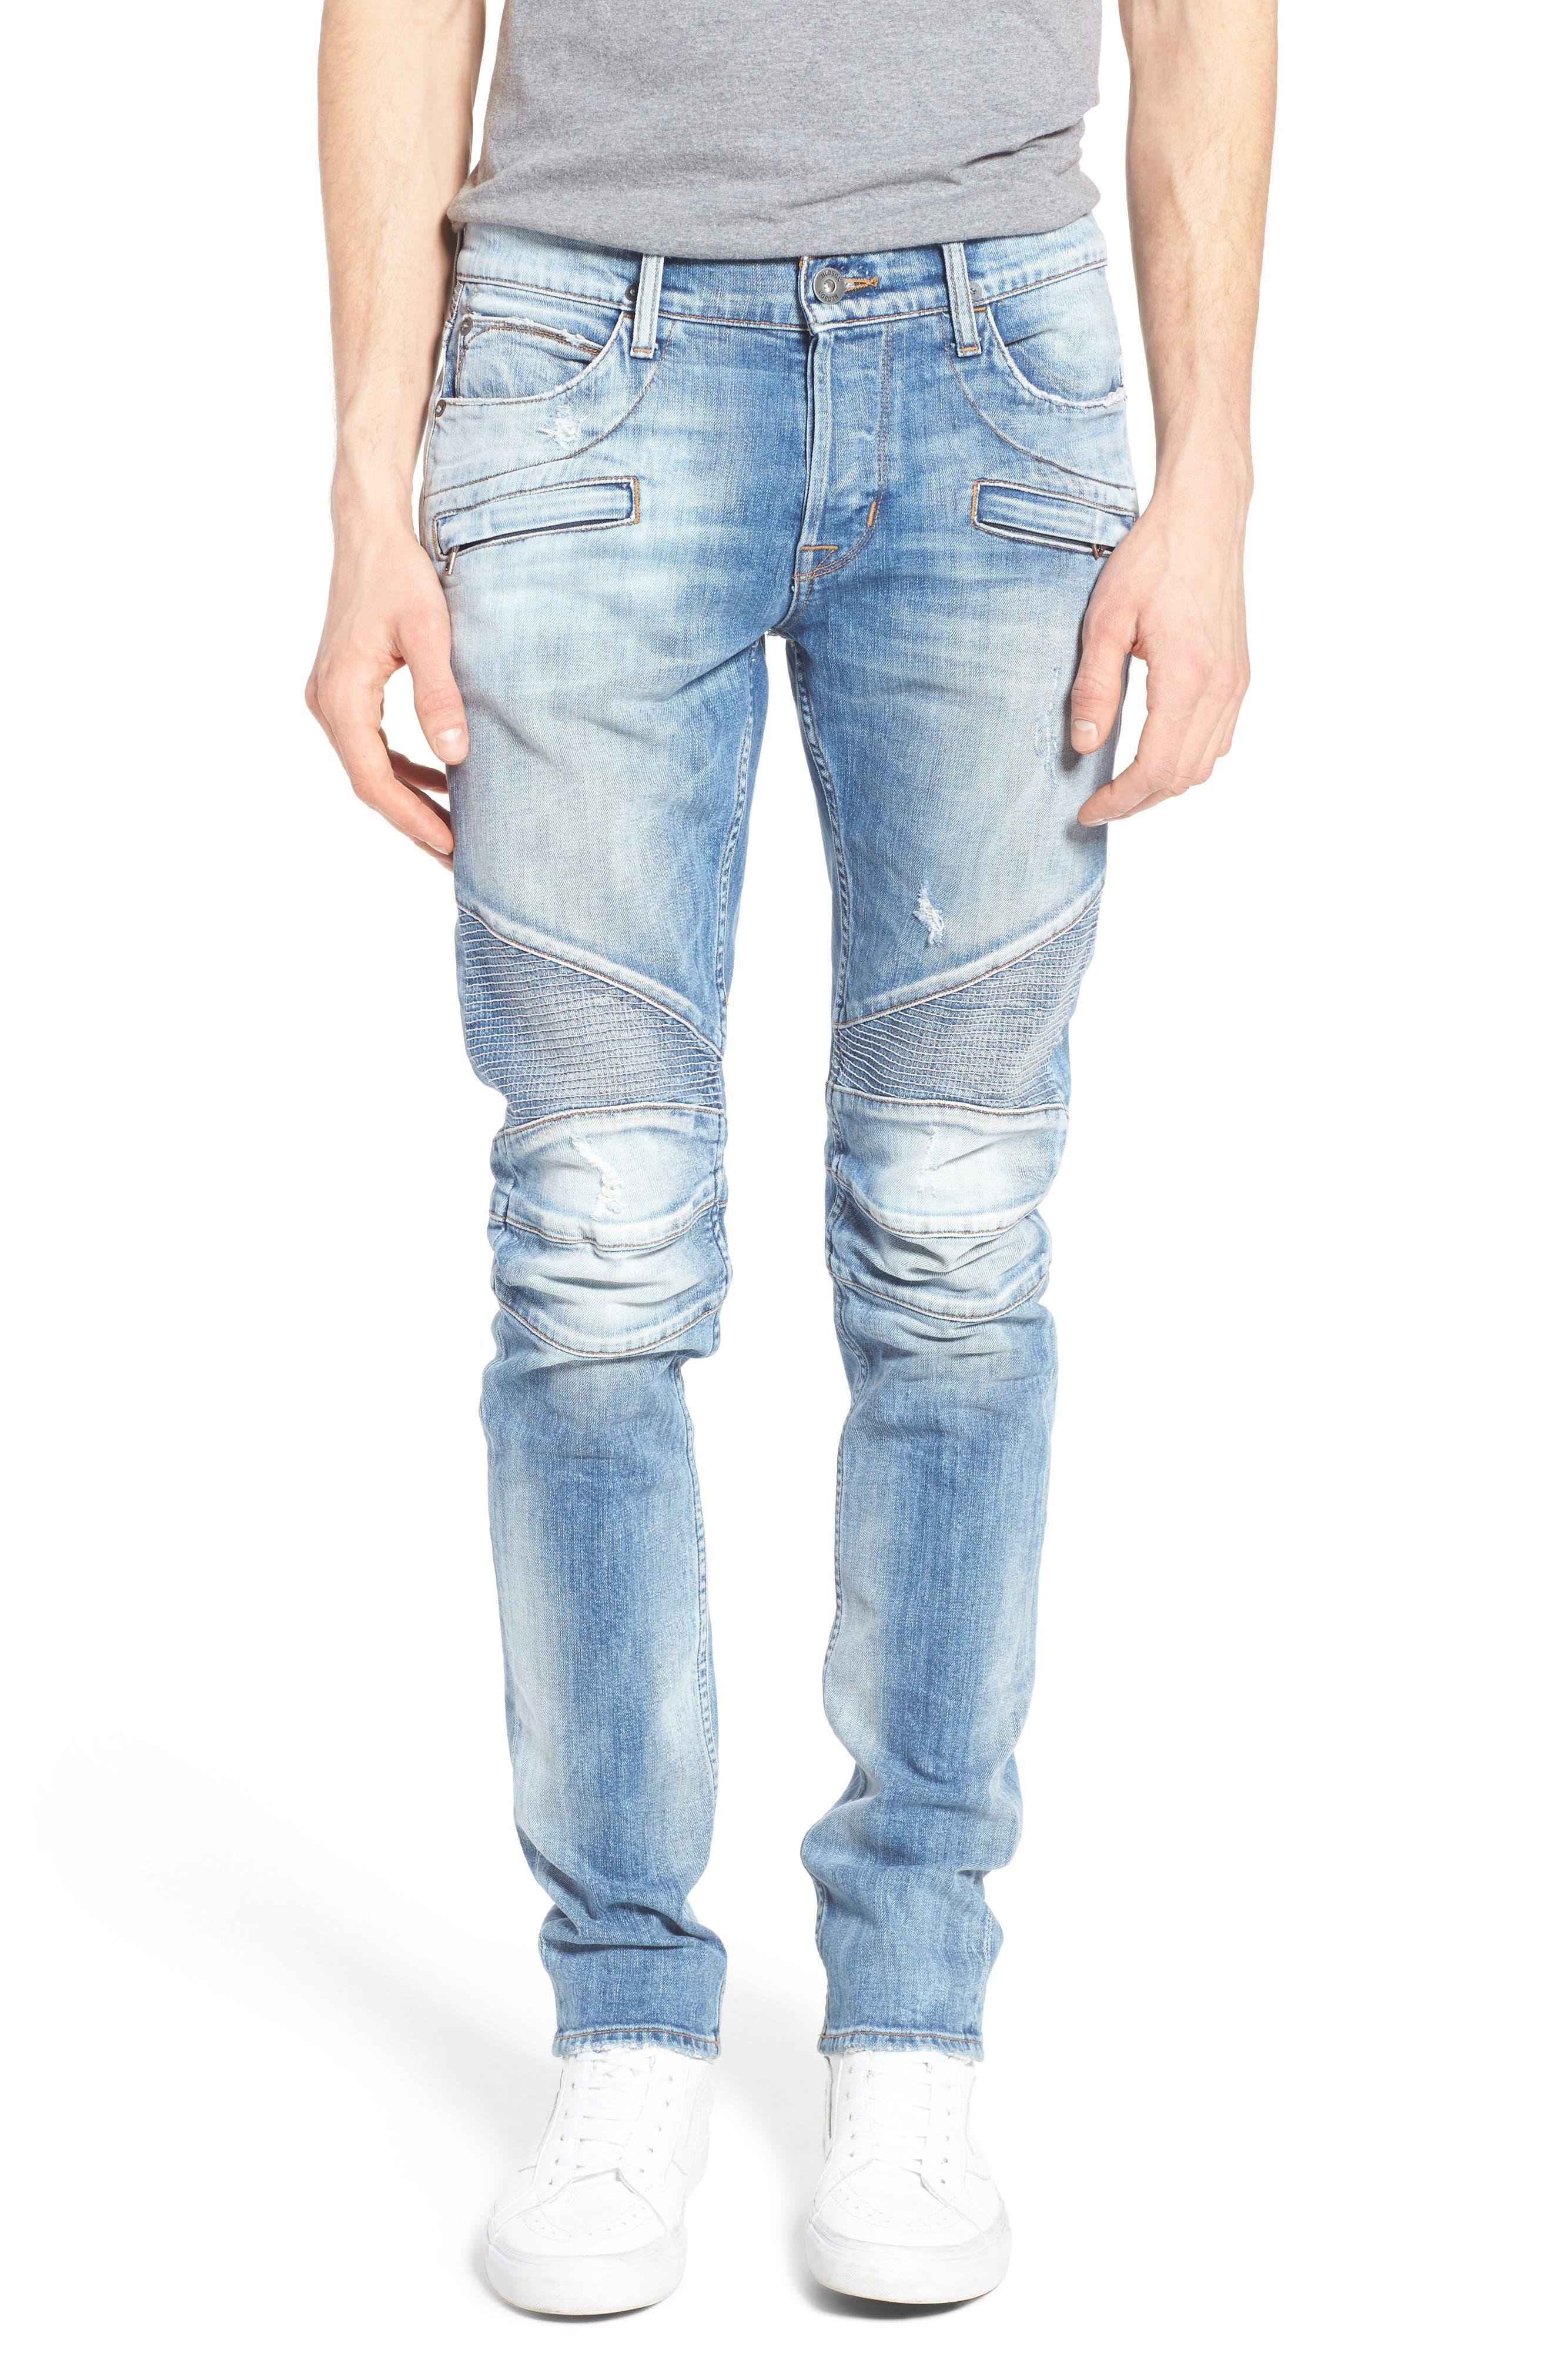 Blinder Skinny Fit Moto Jeans,                             Main thumbnail 1, color,                             THRASH